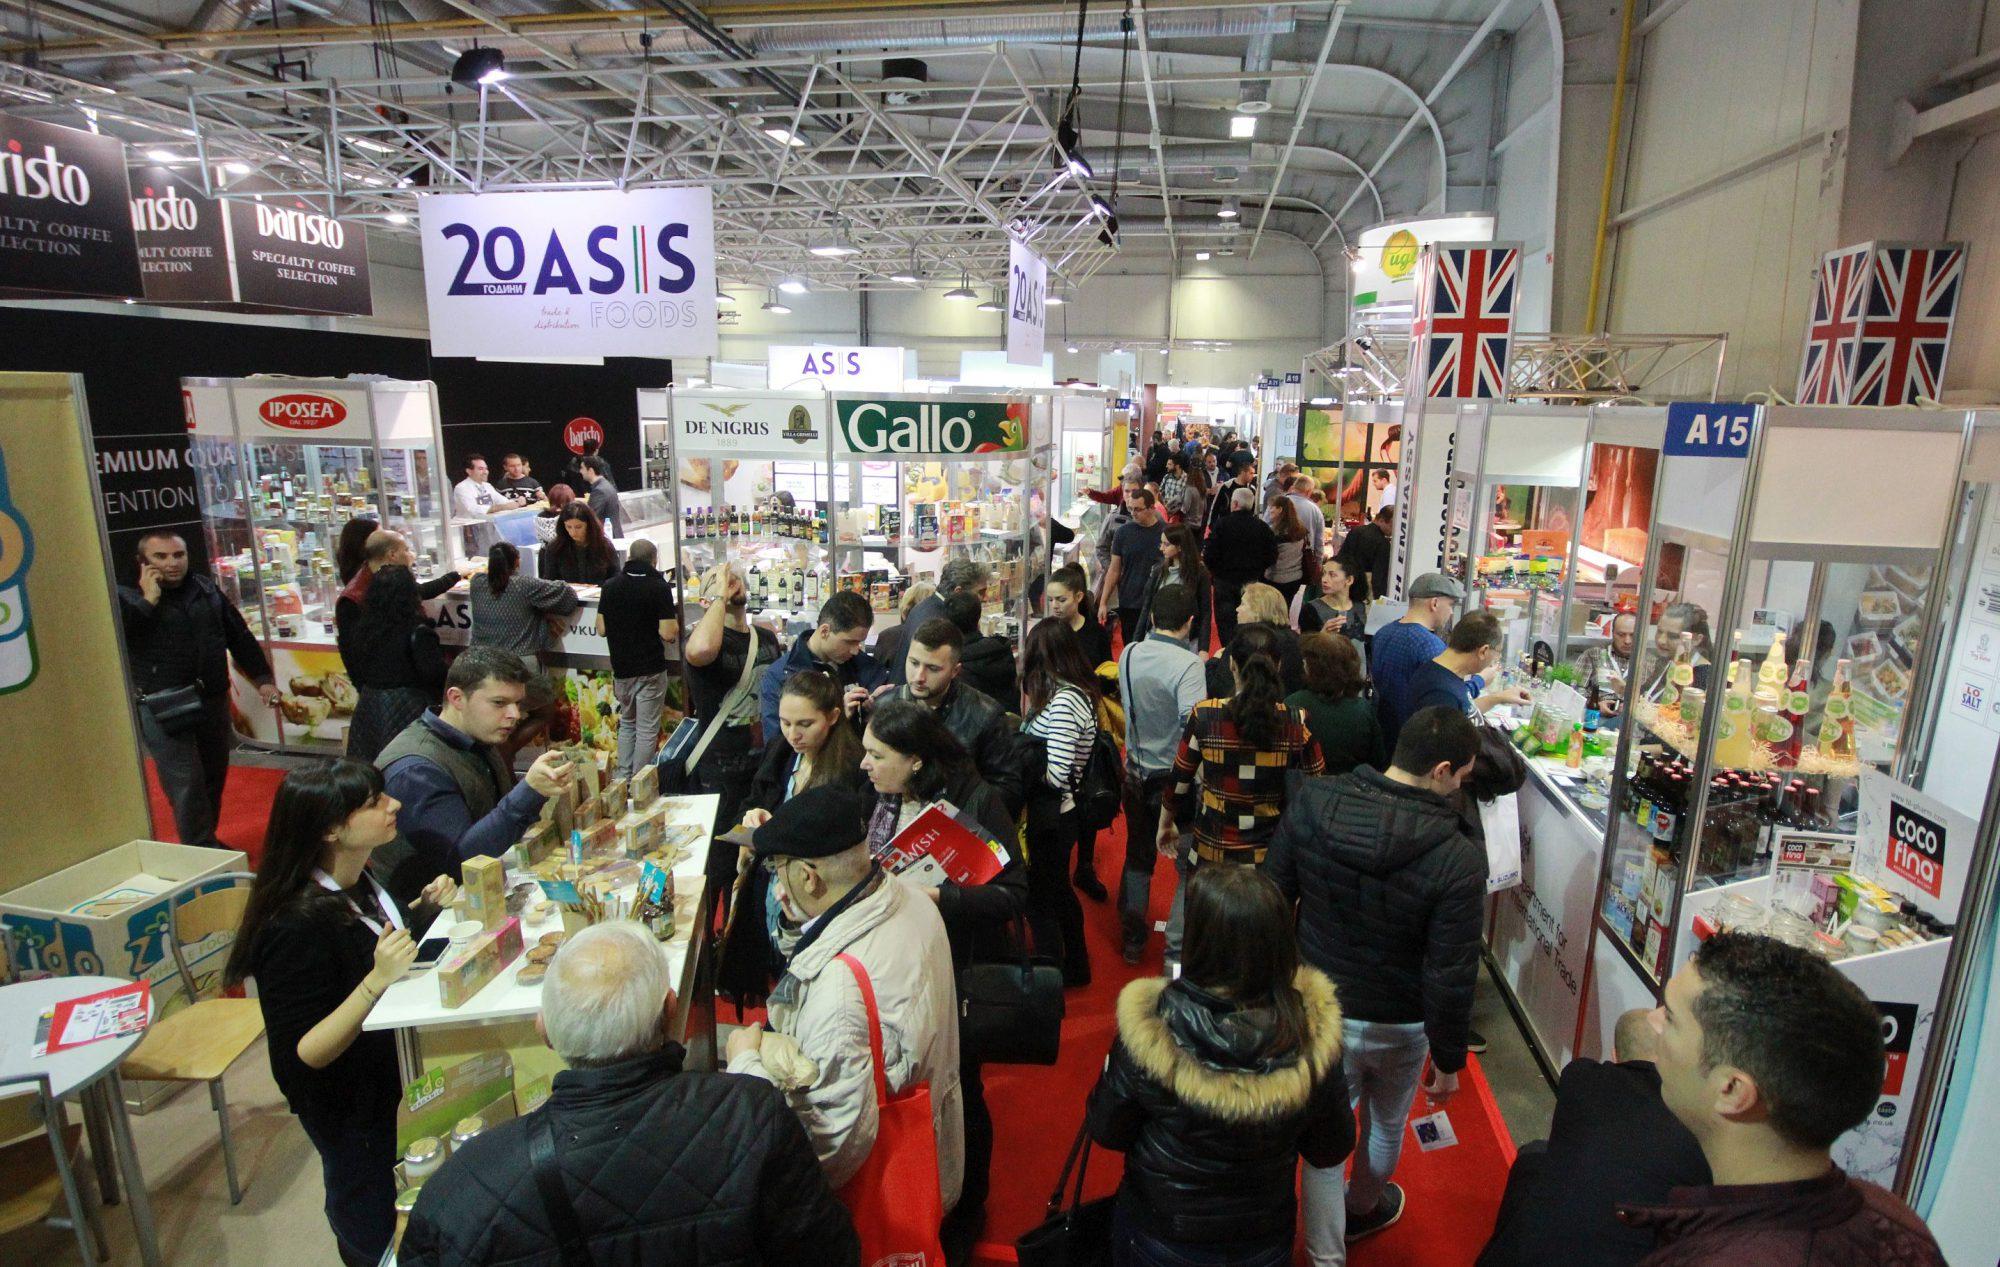 Food & HoReCa Exhibitions 7-10 November 2018 in Sofia